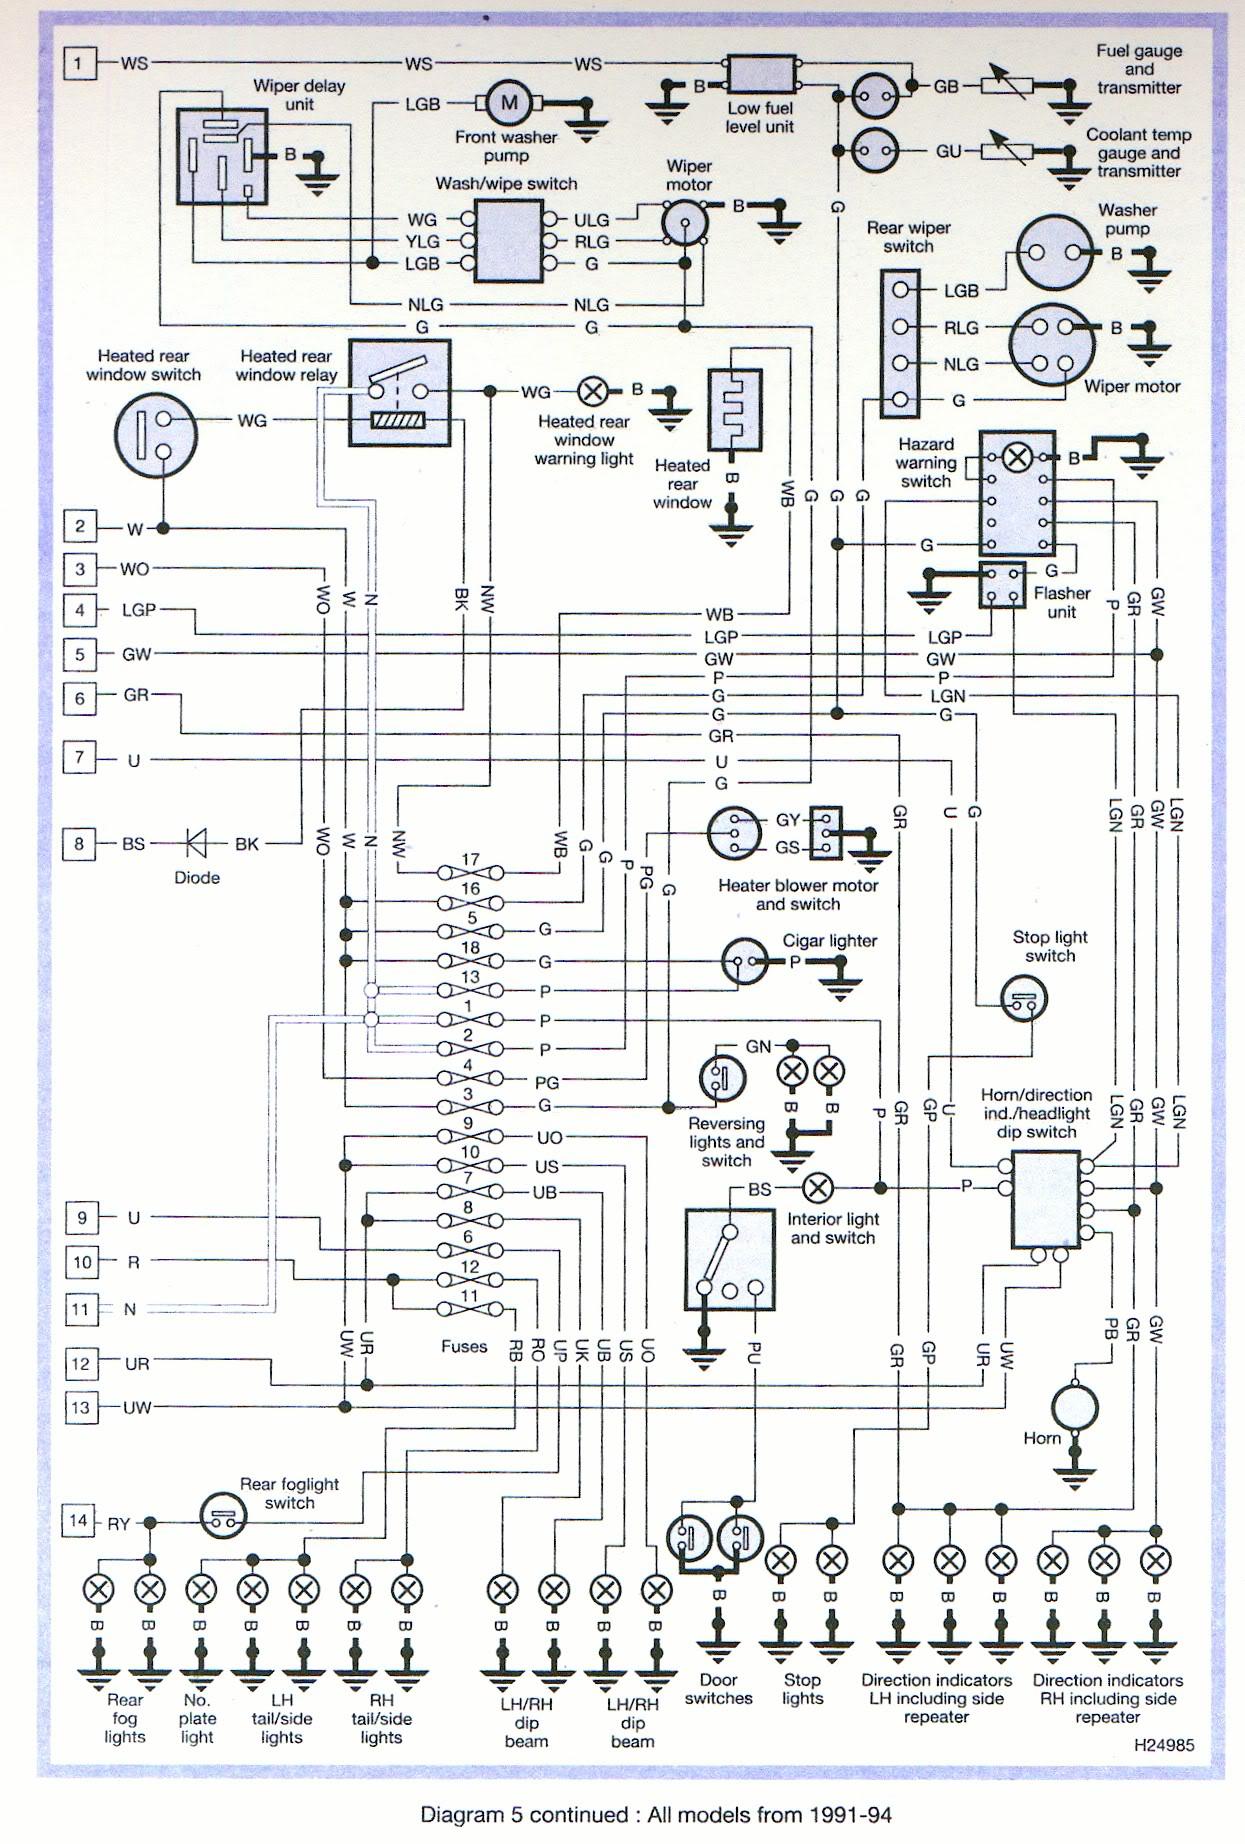 land rover defender light wiring diagram trusted wiring diagrams rh hamze co Land Rover Radio Wiring Land Rover Discovery Radiator Diagram